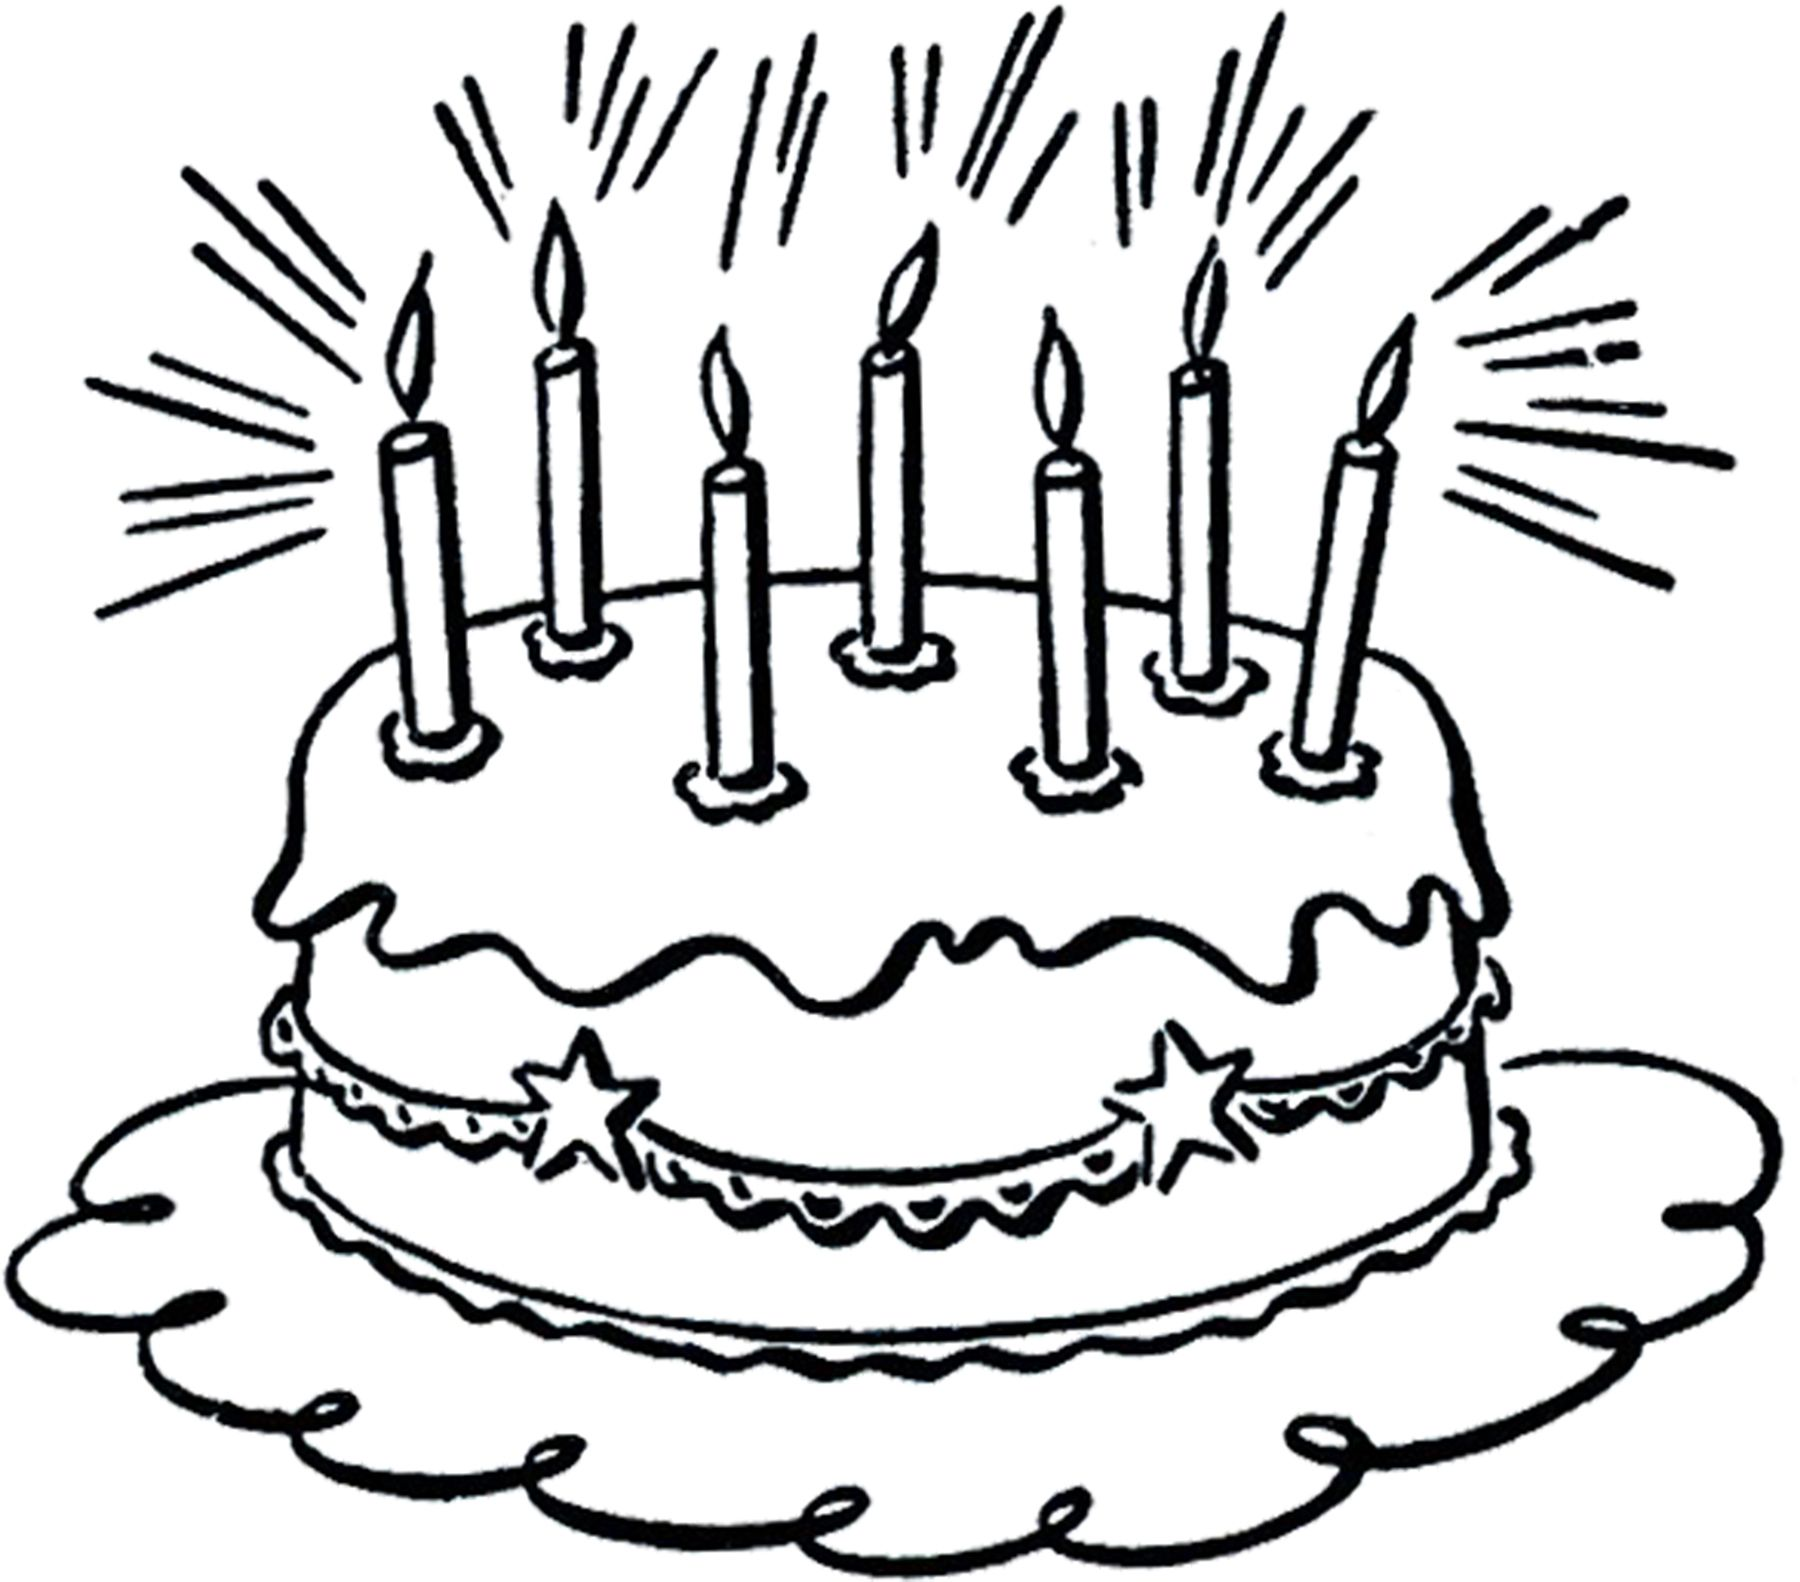 6 Birthday Cake Images Vintage Birthday Vintage Birthday Cakes